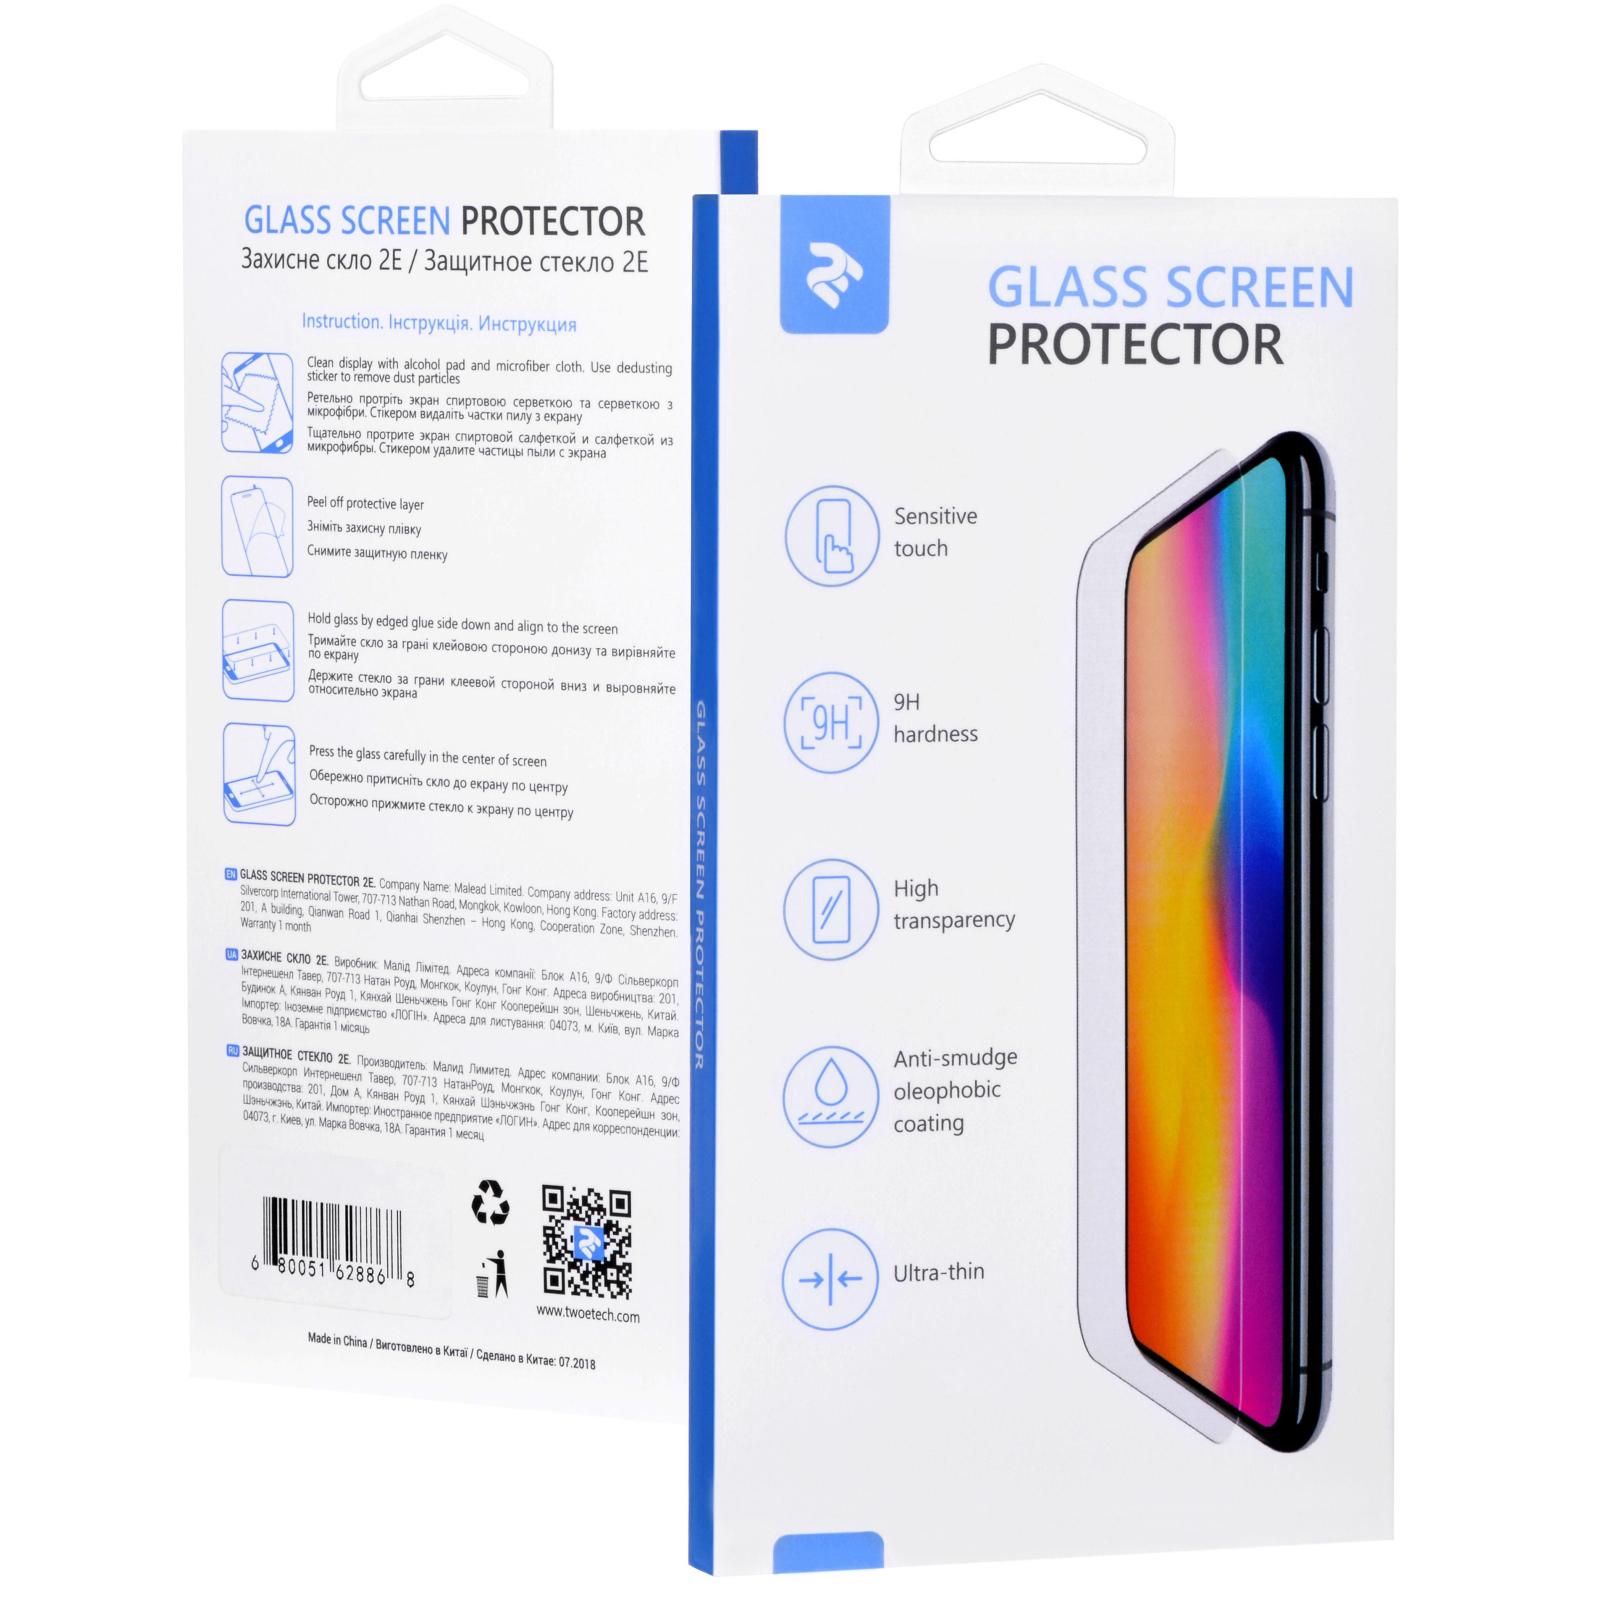 Стекло защитное 2E для Huawei Y6 2018 2.5D Clear (2E-TGHW-Y618-25D)